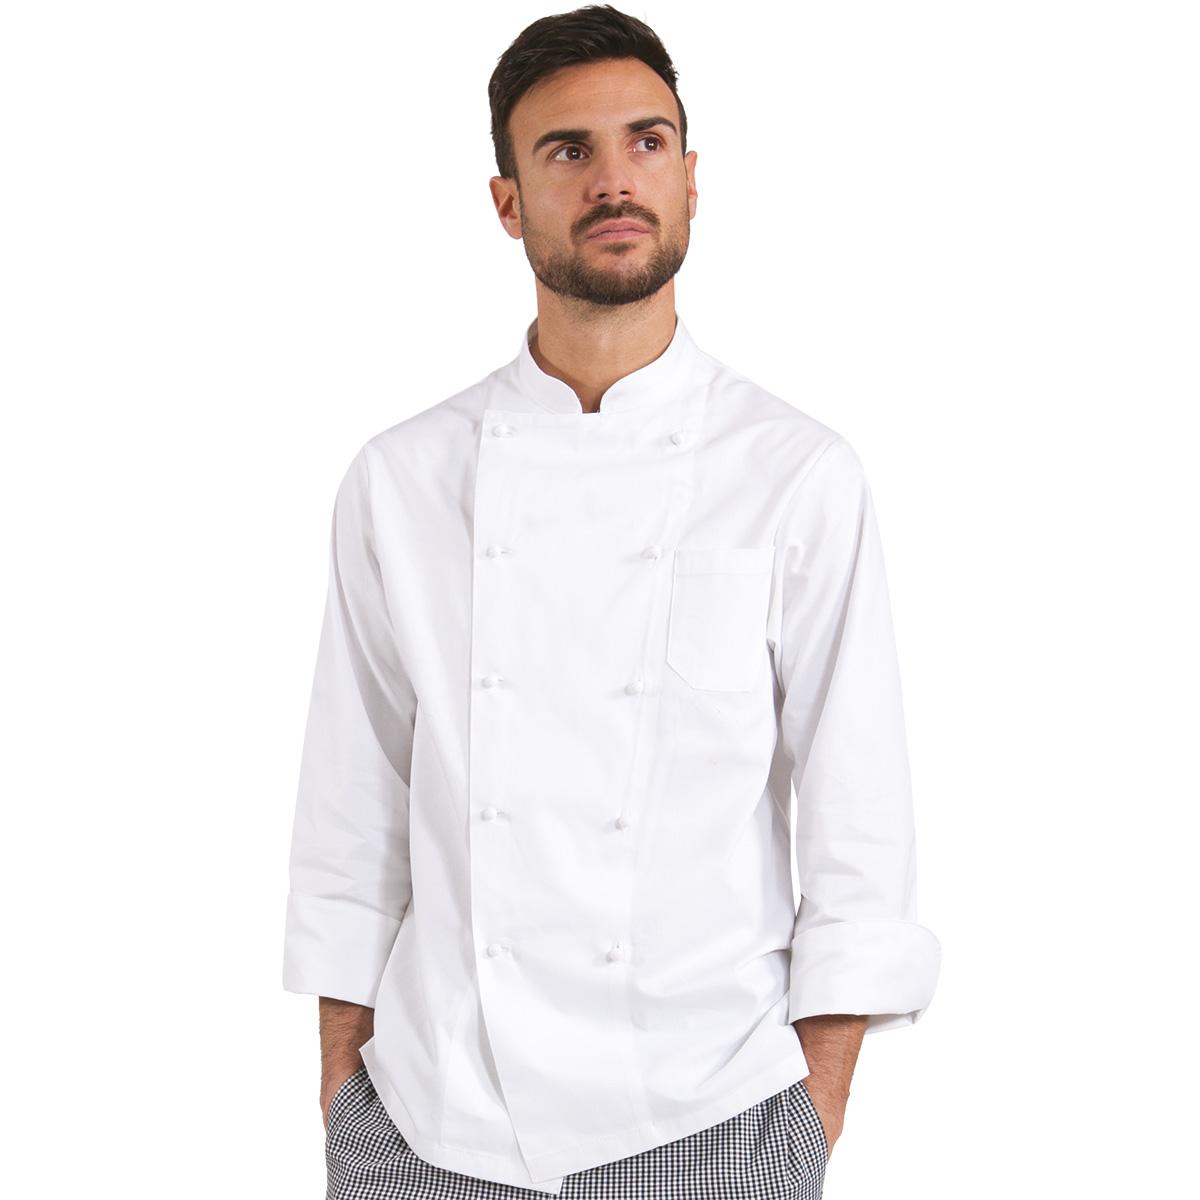 giacca-cuoco-classica-uomo